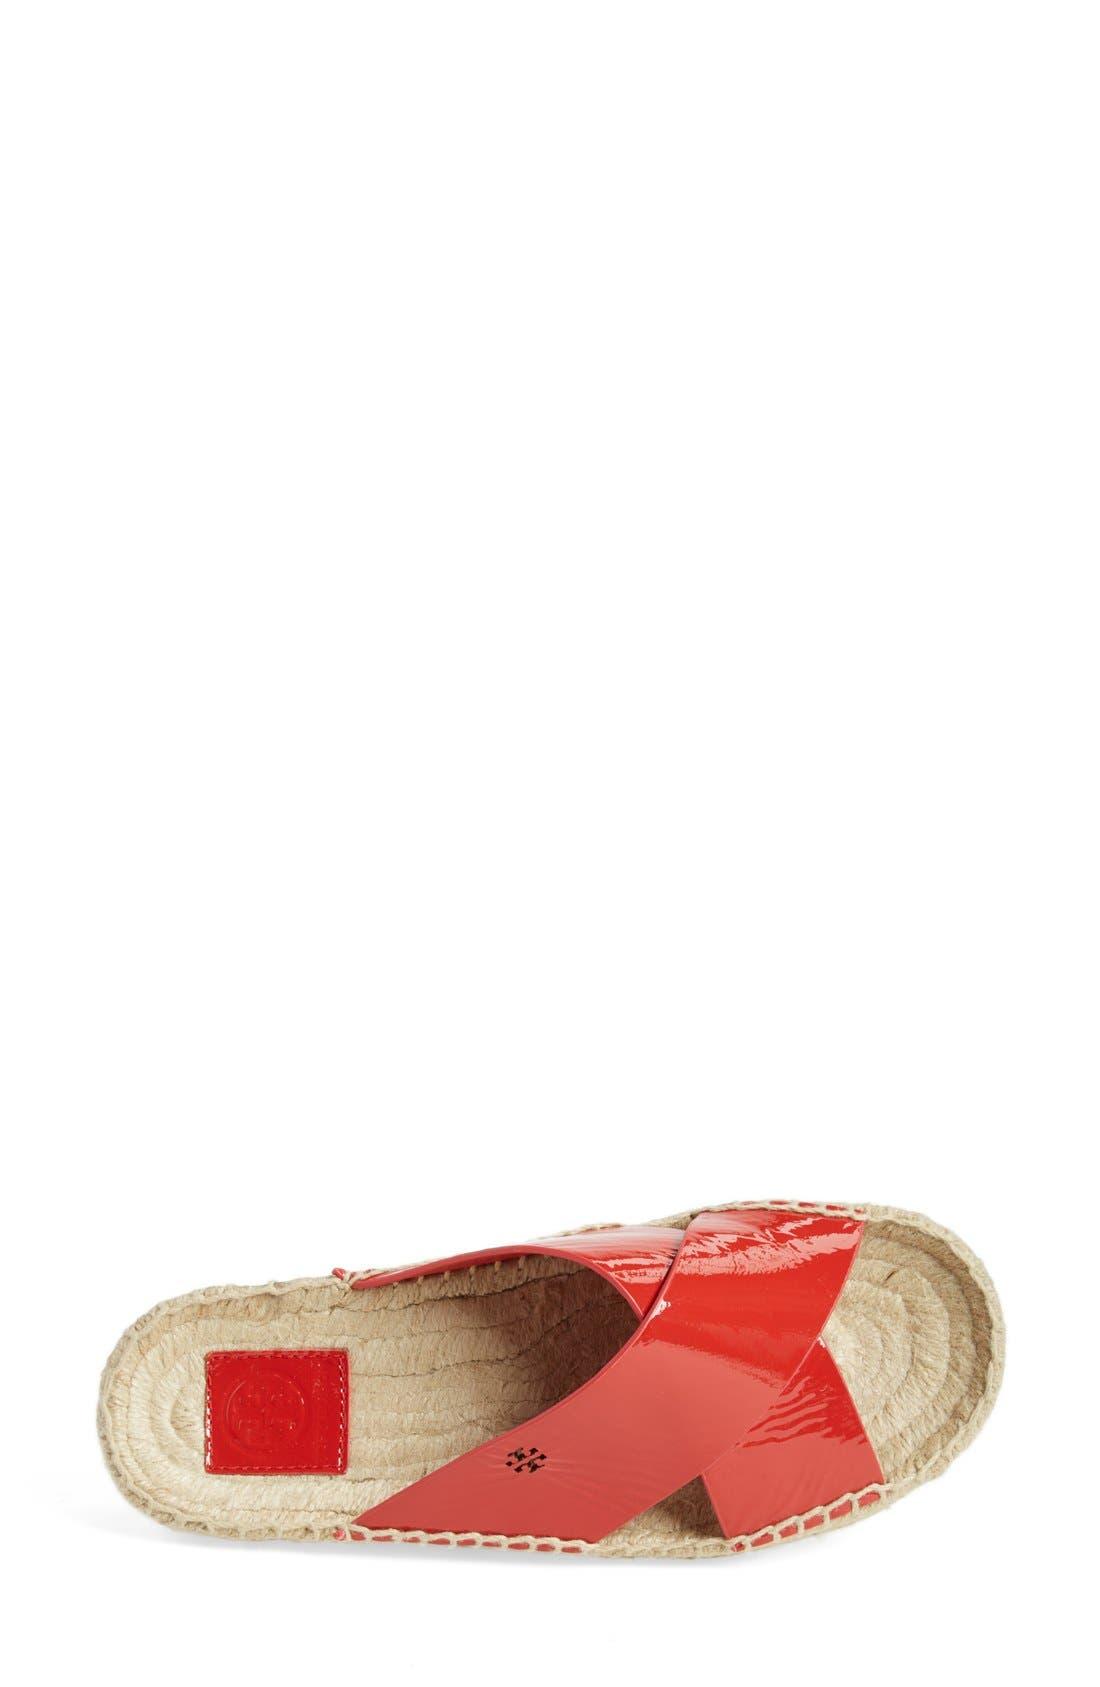 TORY BURCH,                             'Bima' Espadrille Slide Sandal,                             Alternate thumbnail 4, color,                             601